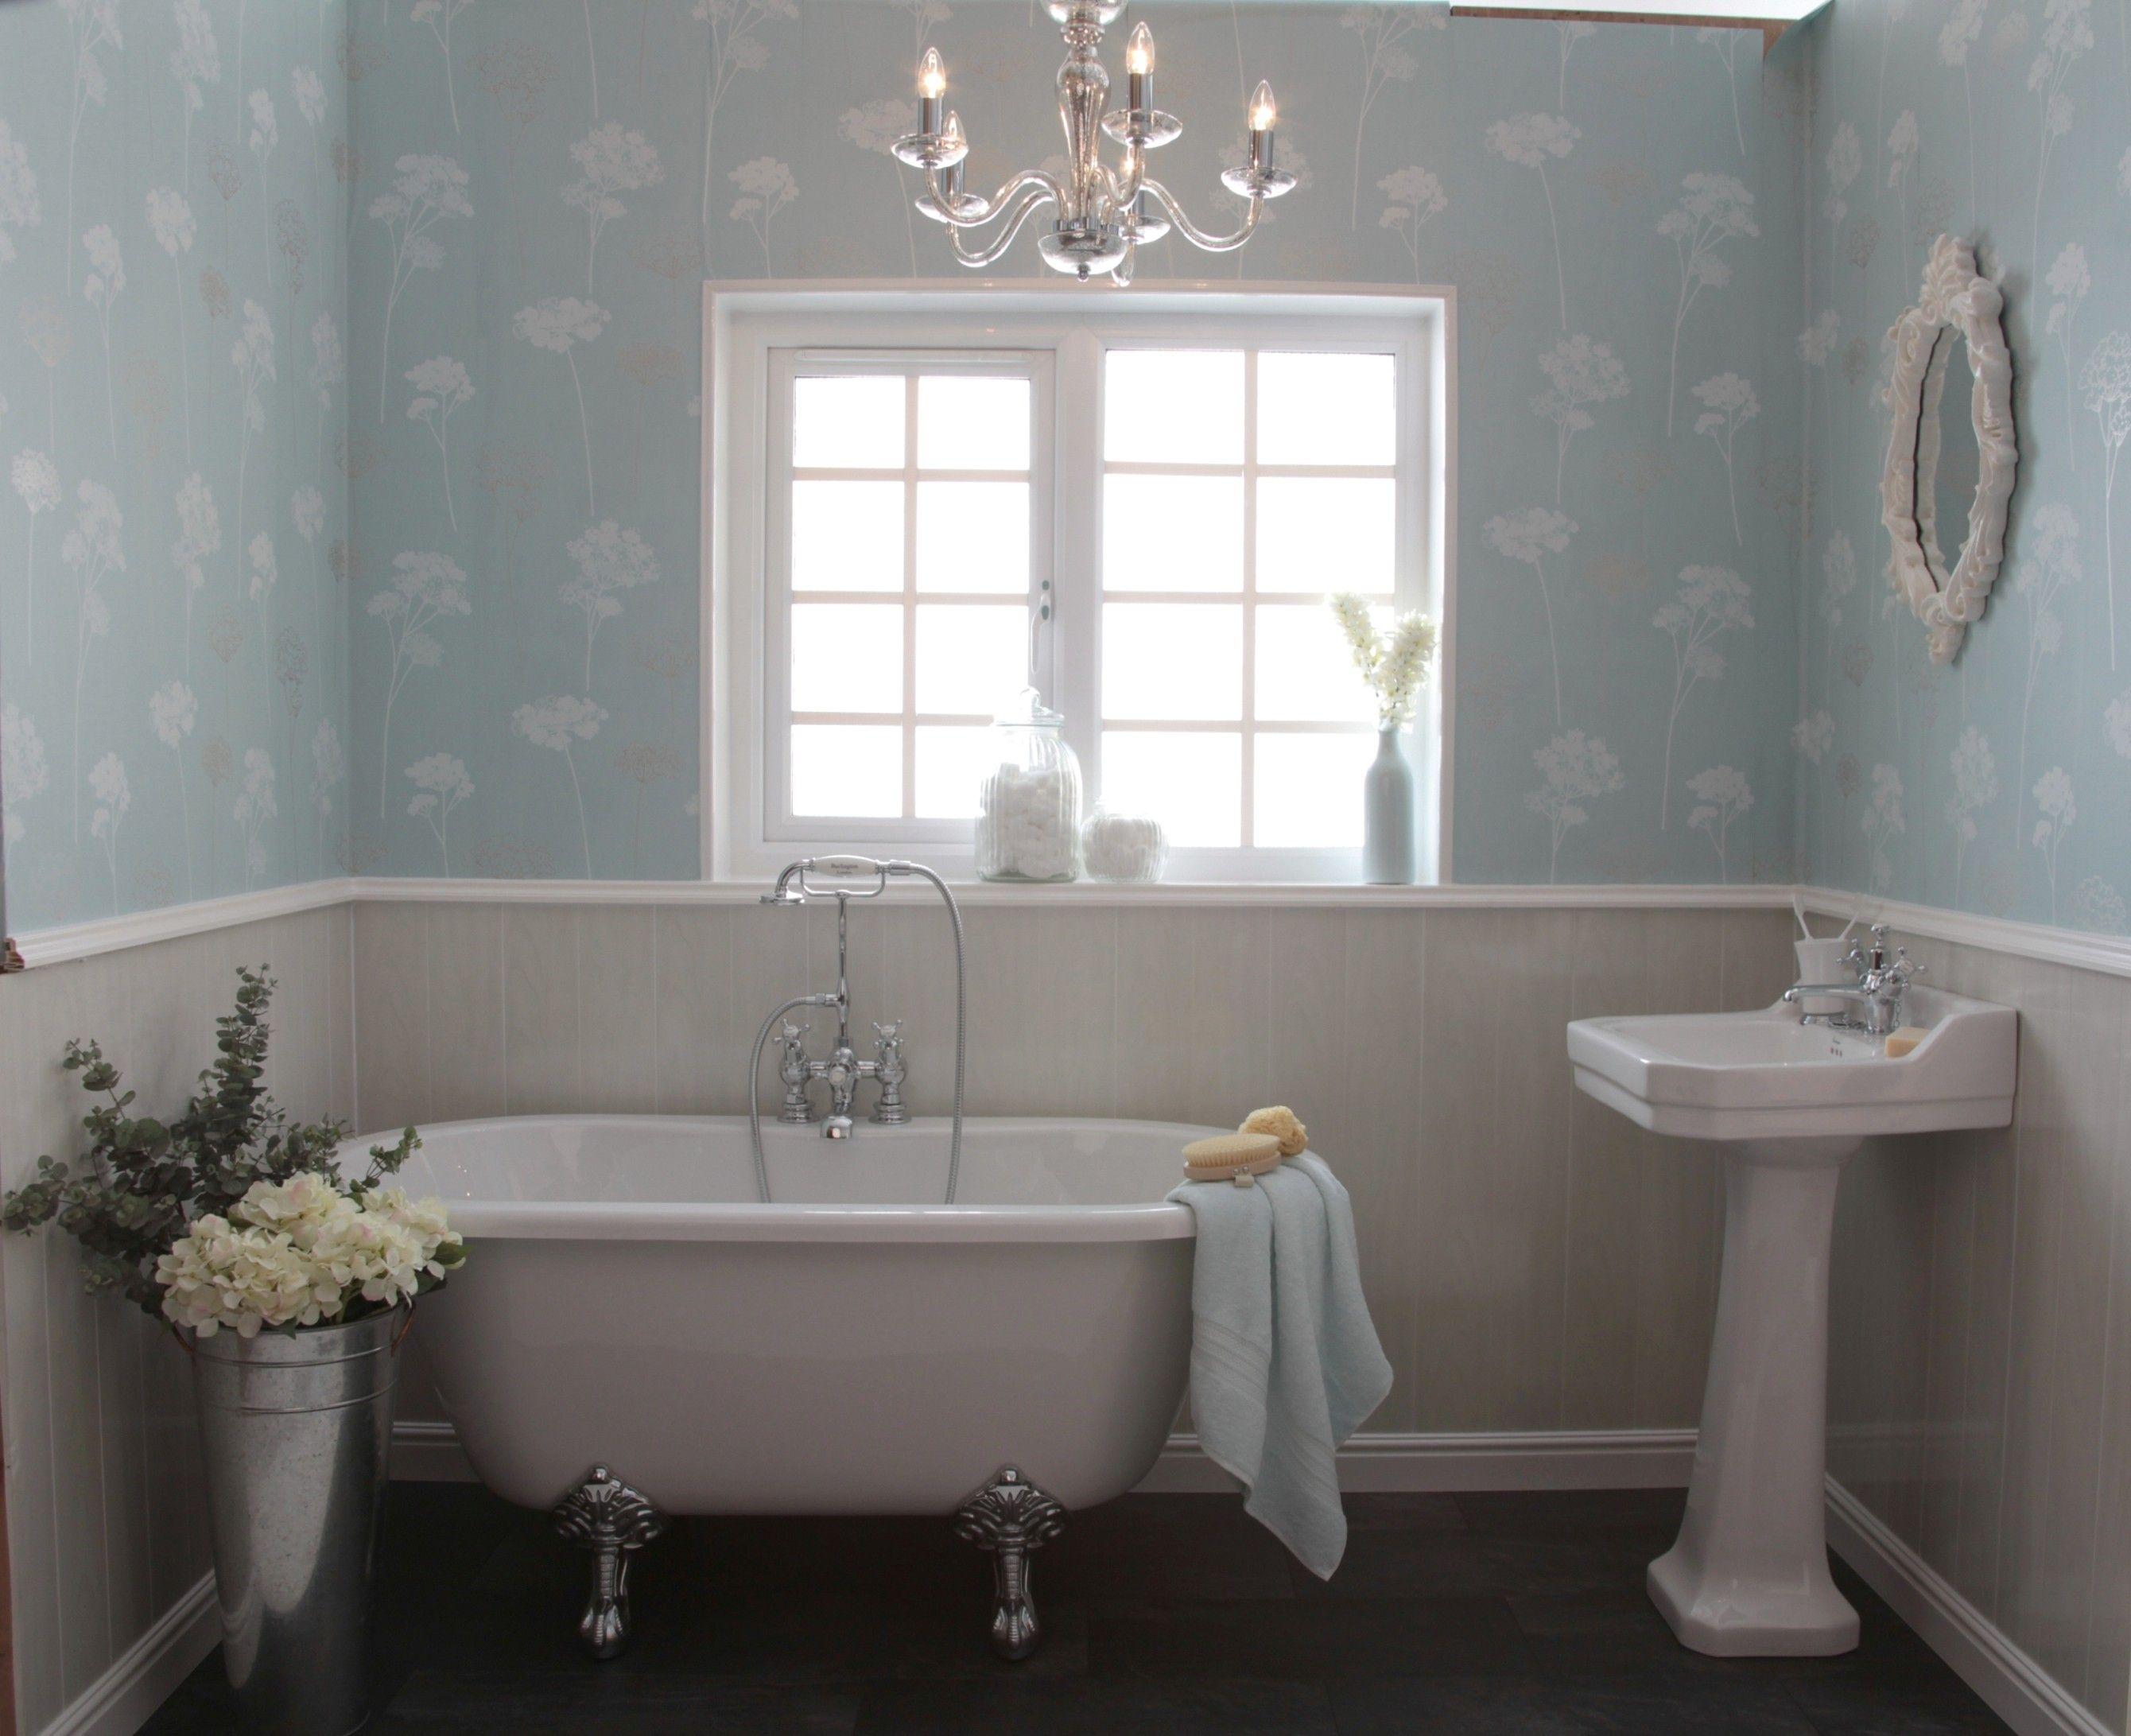 Swish Marbrex White Wood Bathroom Wall Cladding (With ...